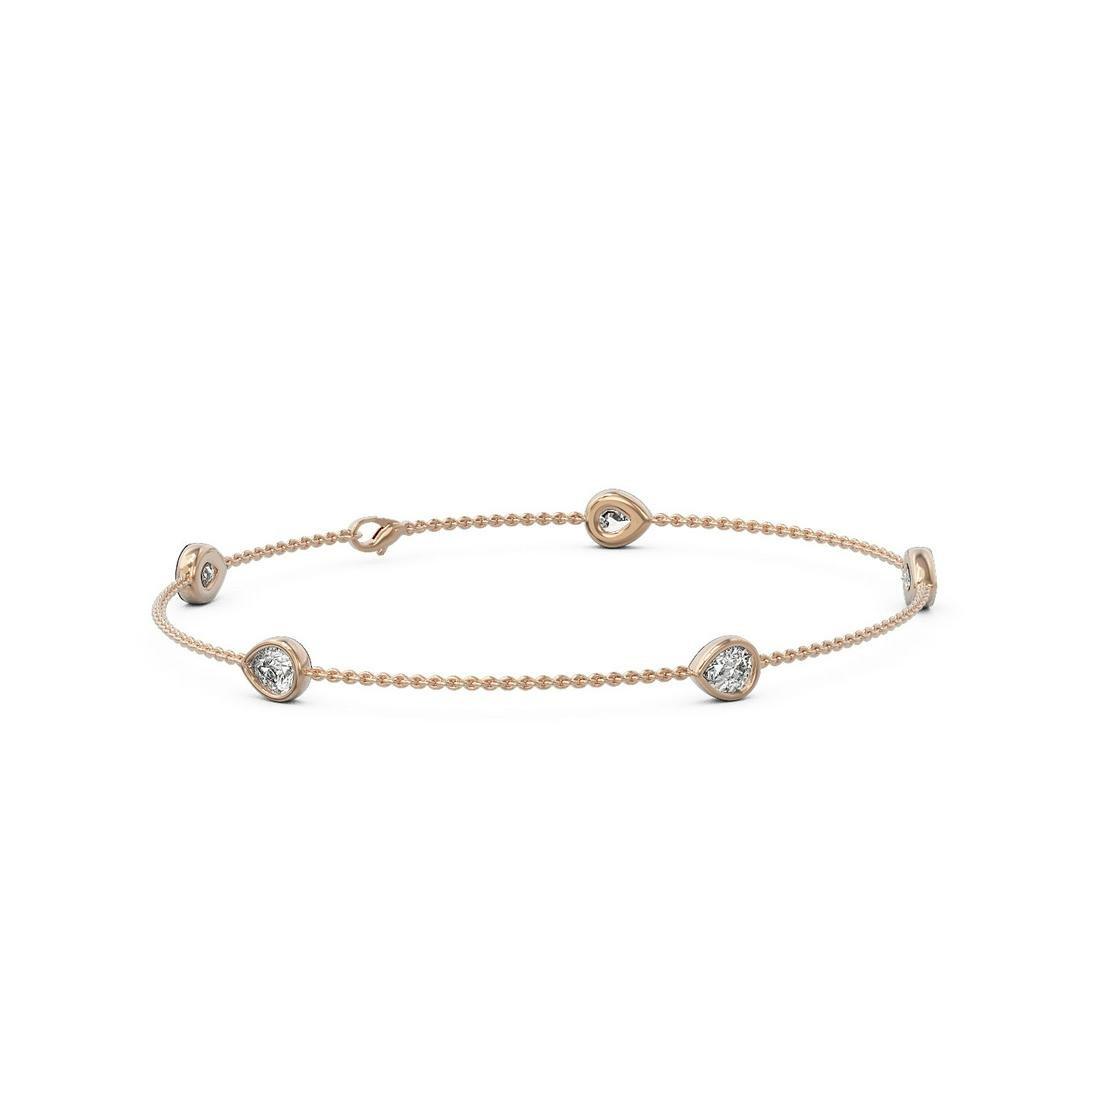 1.65 ctw Pear Cut Diamond Station Bracelet 18K Rose